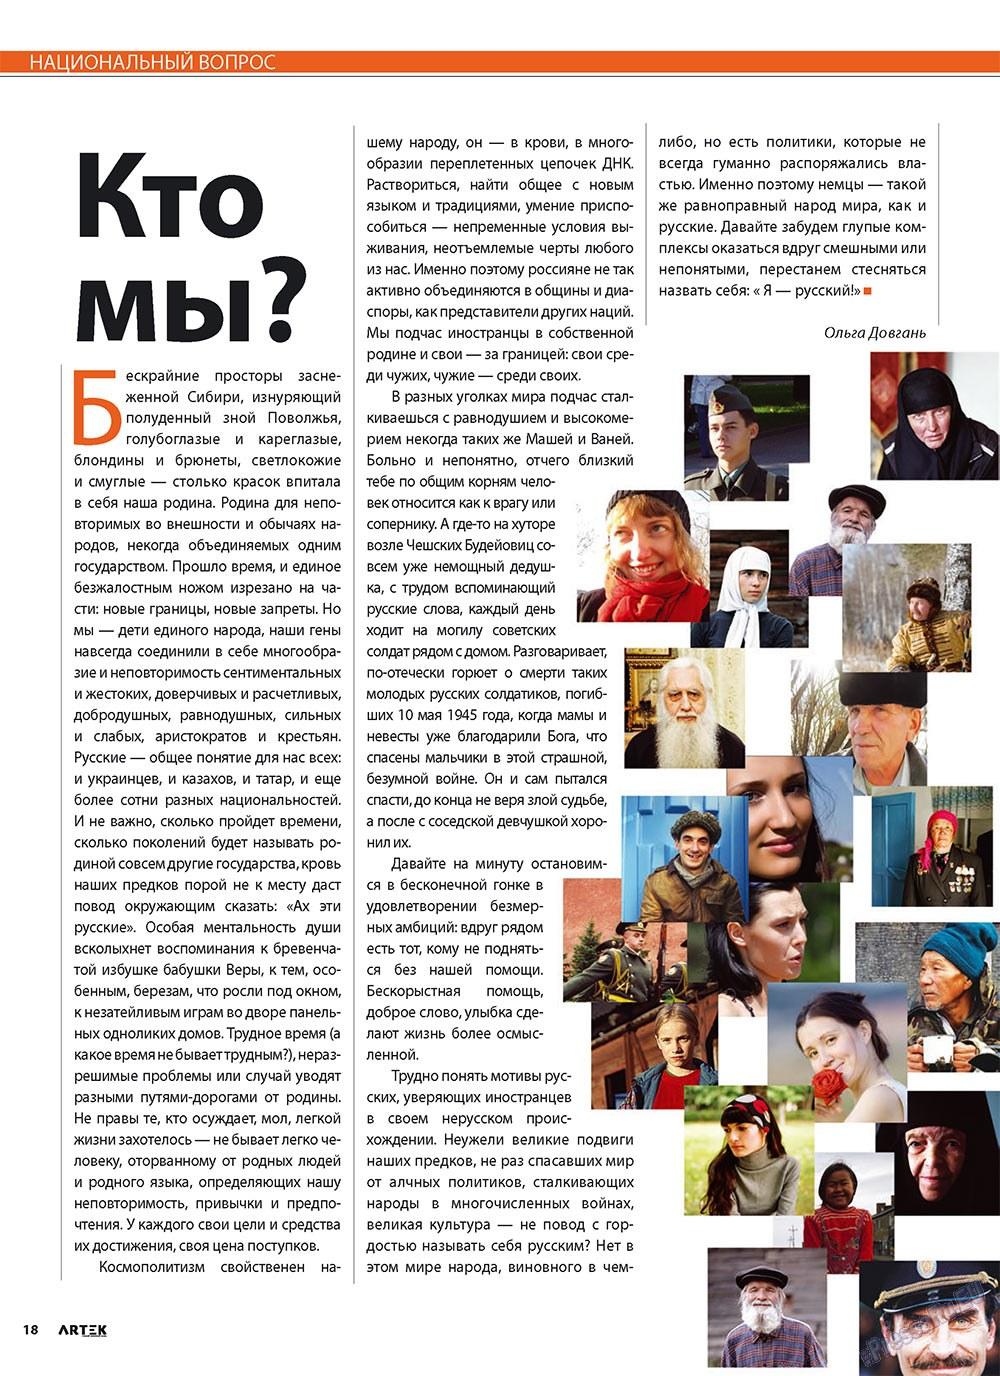 Артек (журнал). 2010 год, номер 2, стр. 20